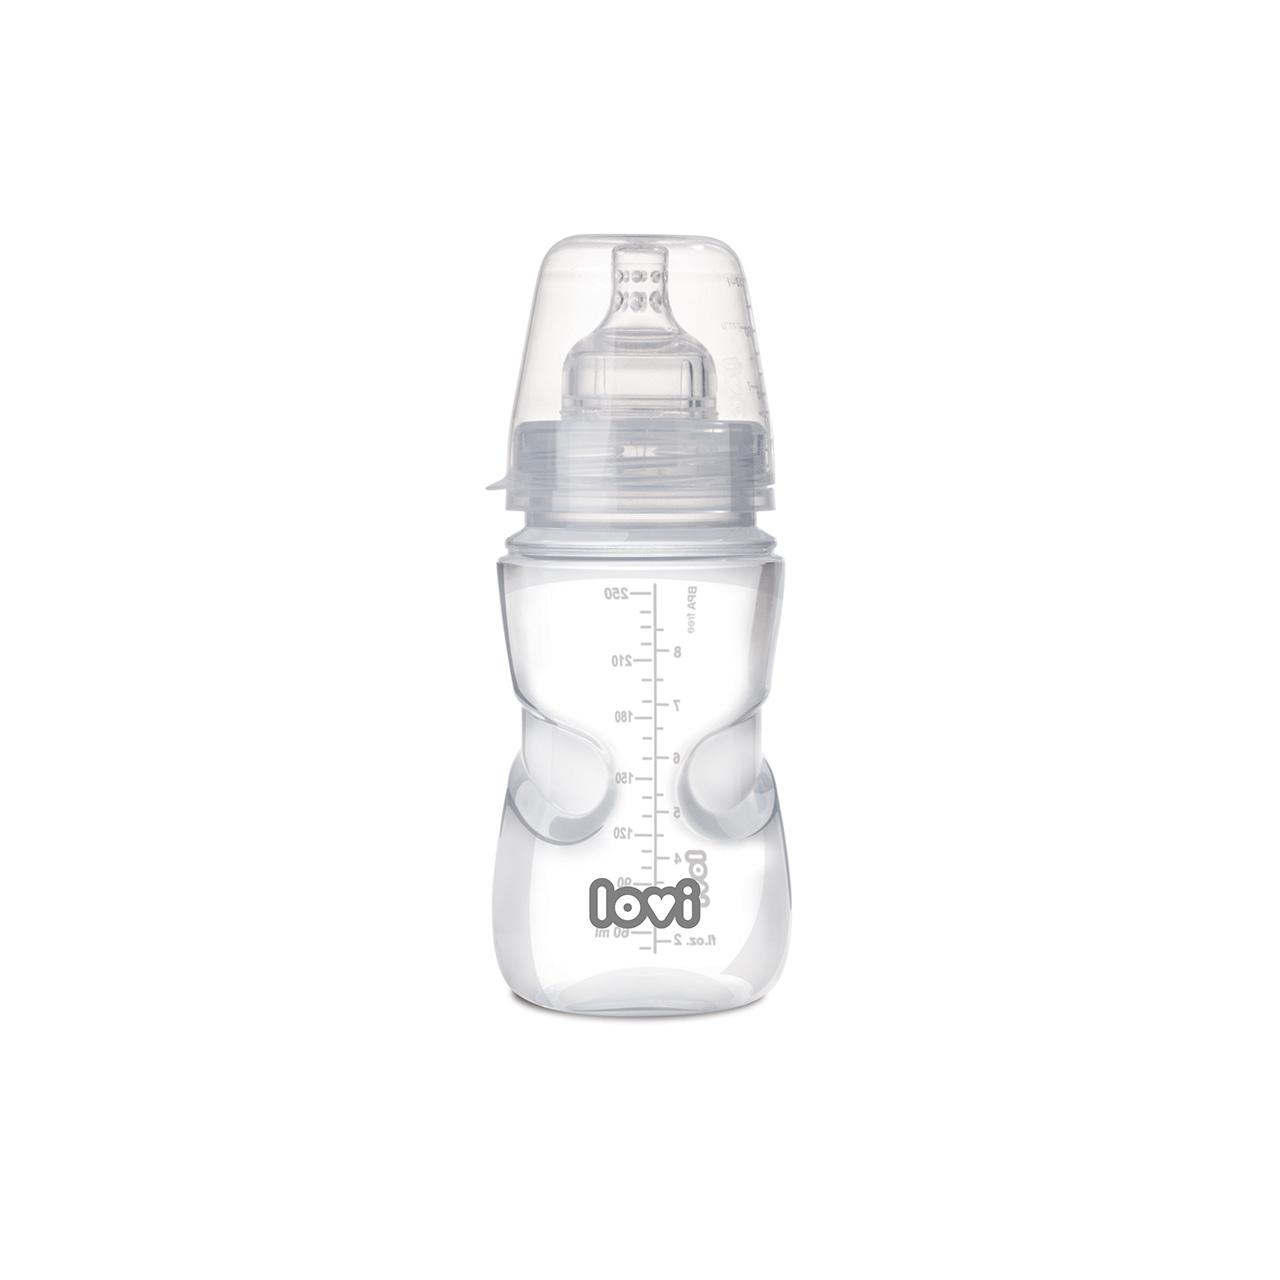 شیشه شیر کودک لاوی مدل 59210 ظرفیت 250 میلی لیتر